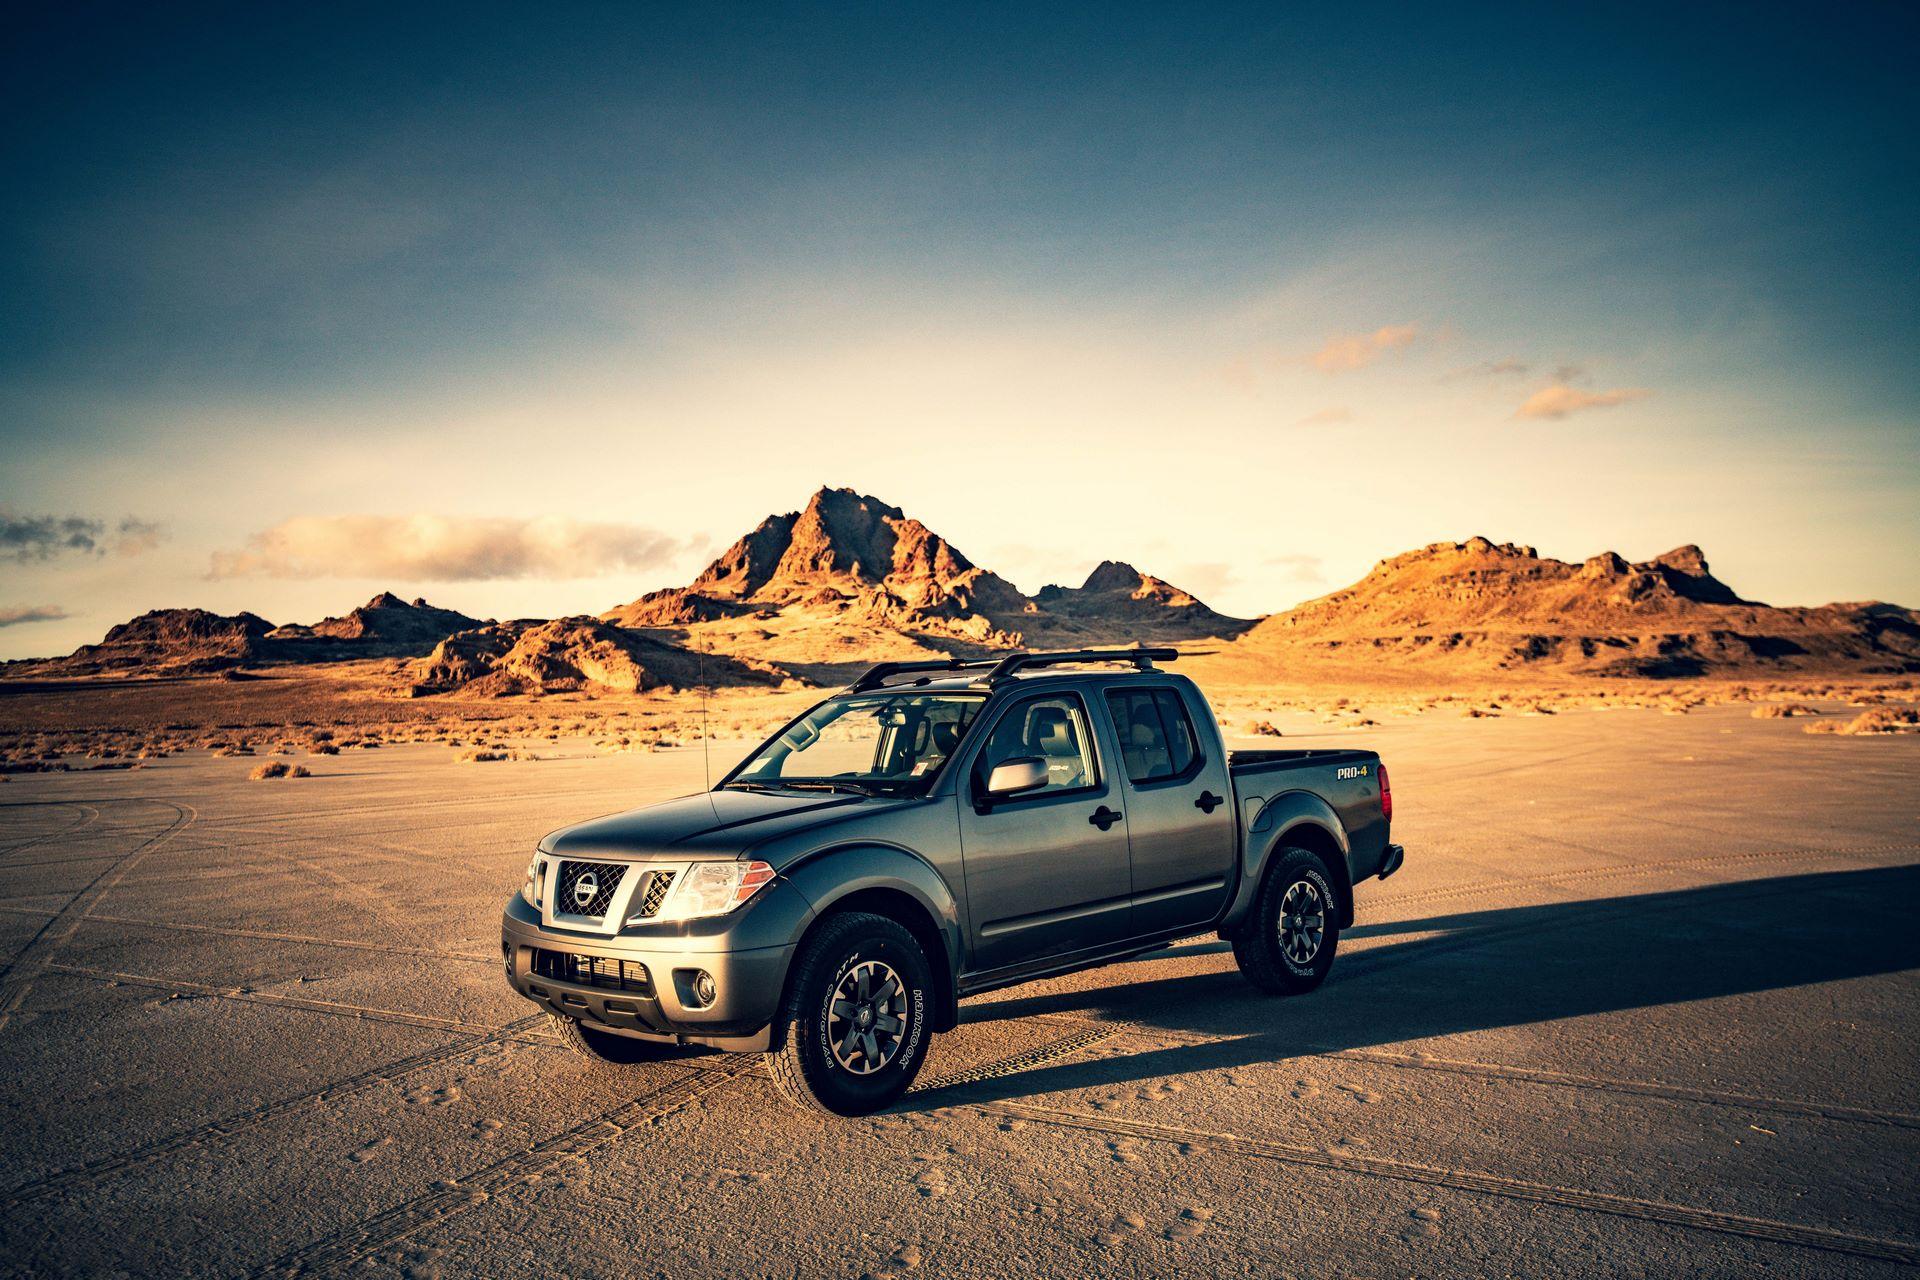 2020-Nissan-Frontier_sunset-3